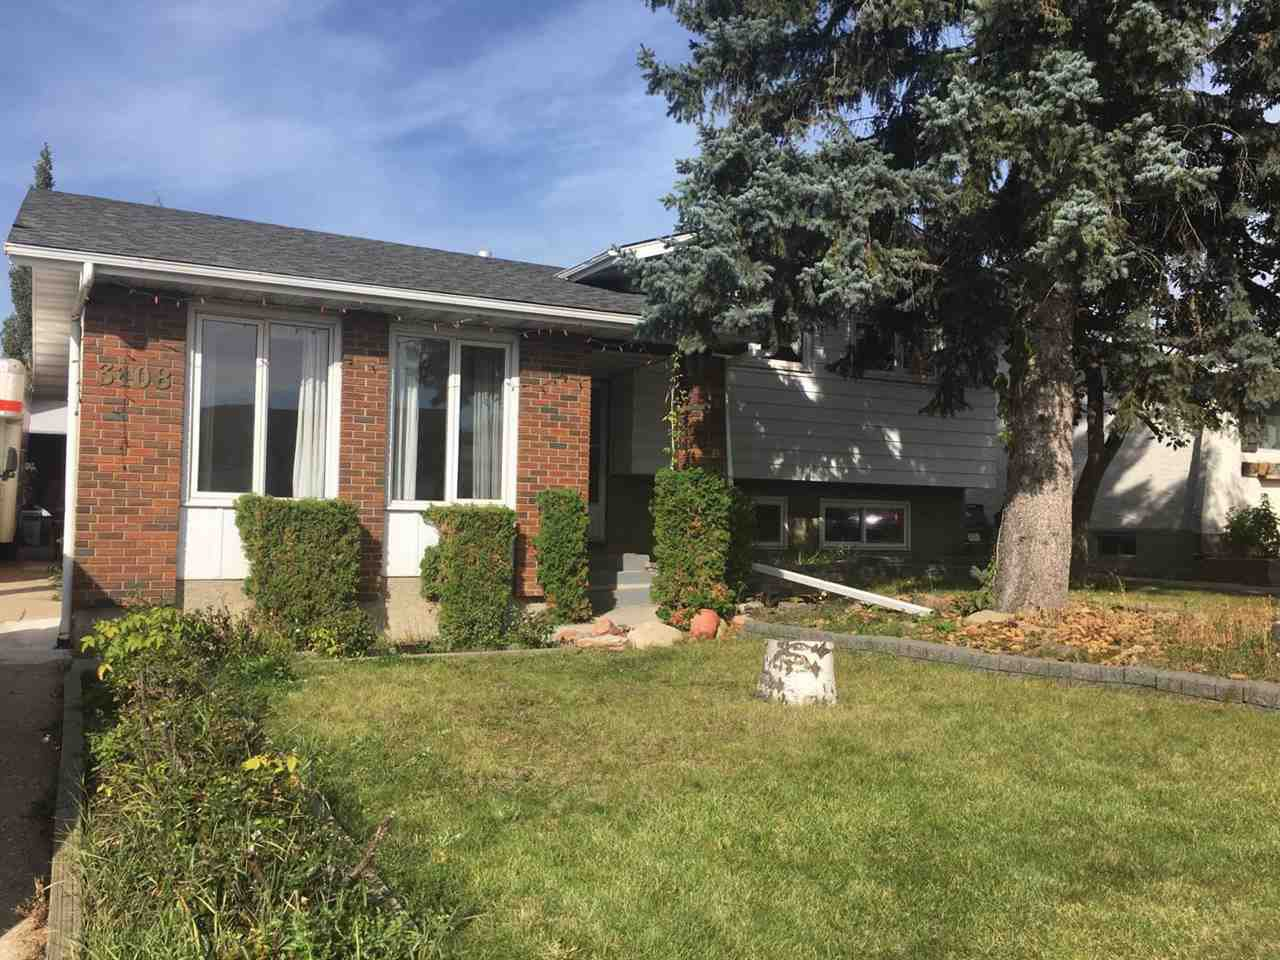 Main Photo: 3108 133A Avenue in Edmonton: Zone 35 House for sale : MLS®# E4181366